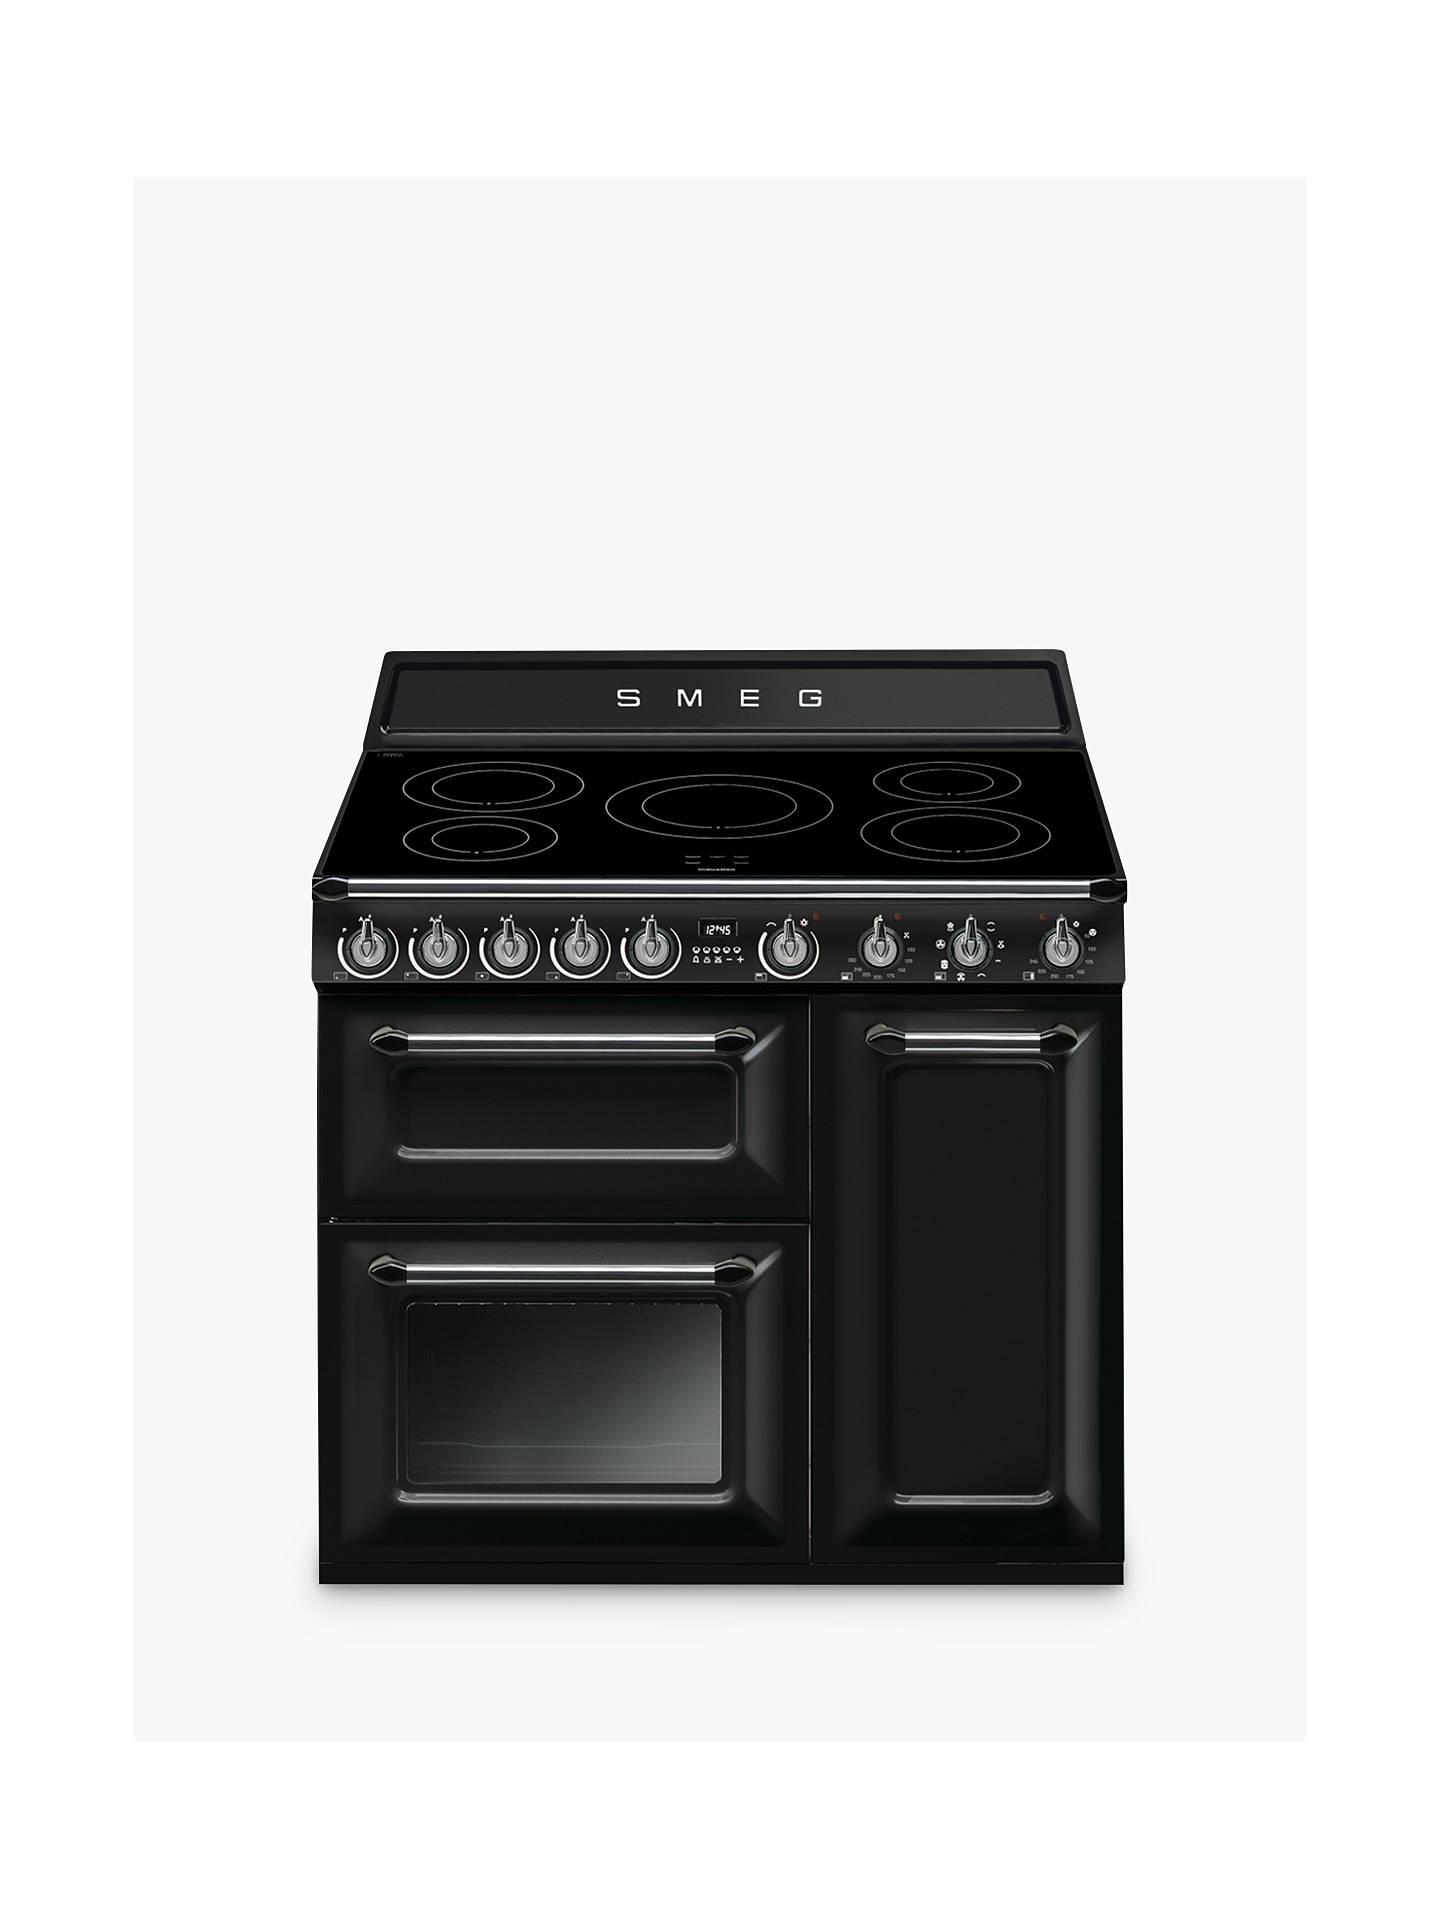 buy smeg tr93ibl 90cm victoria range cooker with induction hob, black  online at johnlewis